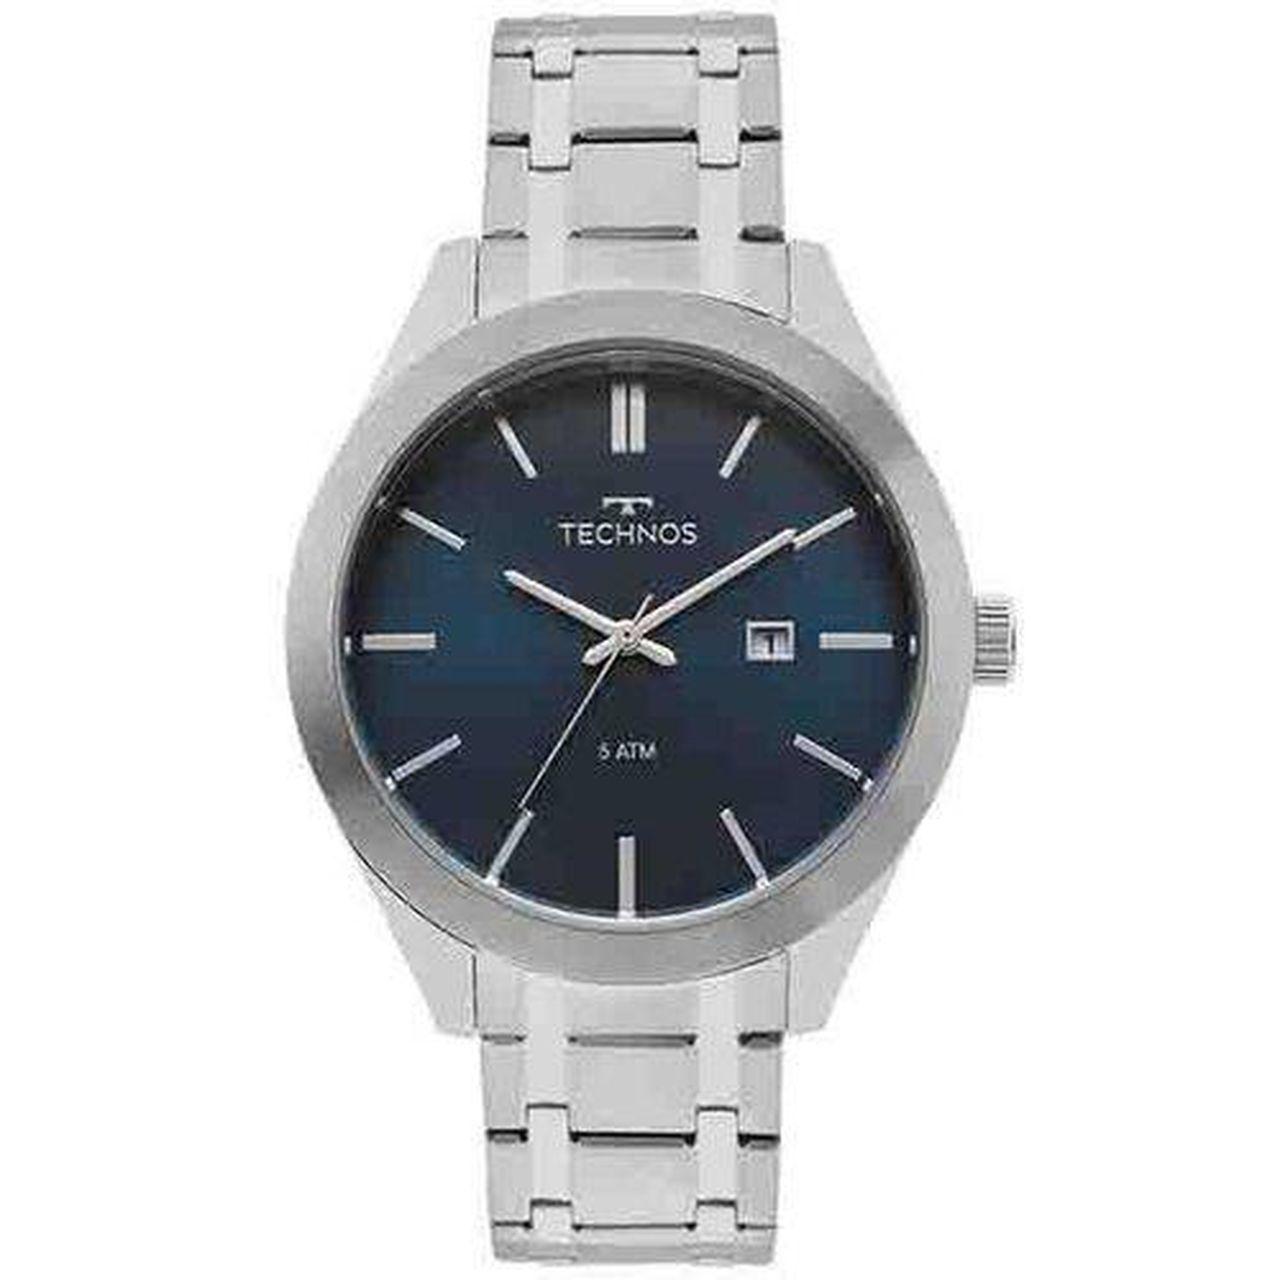 Relógio Technos Classic Steel Masculino 2115mnr1/a Prateado Steel Com Fundo Azul